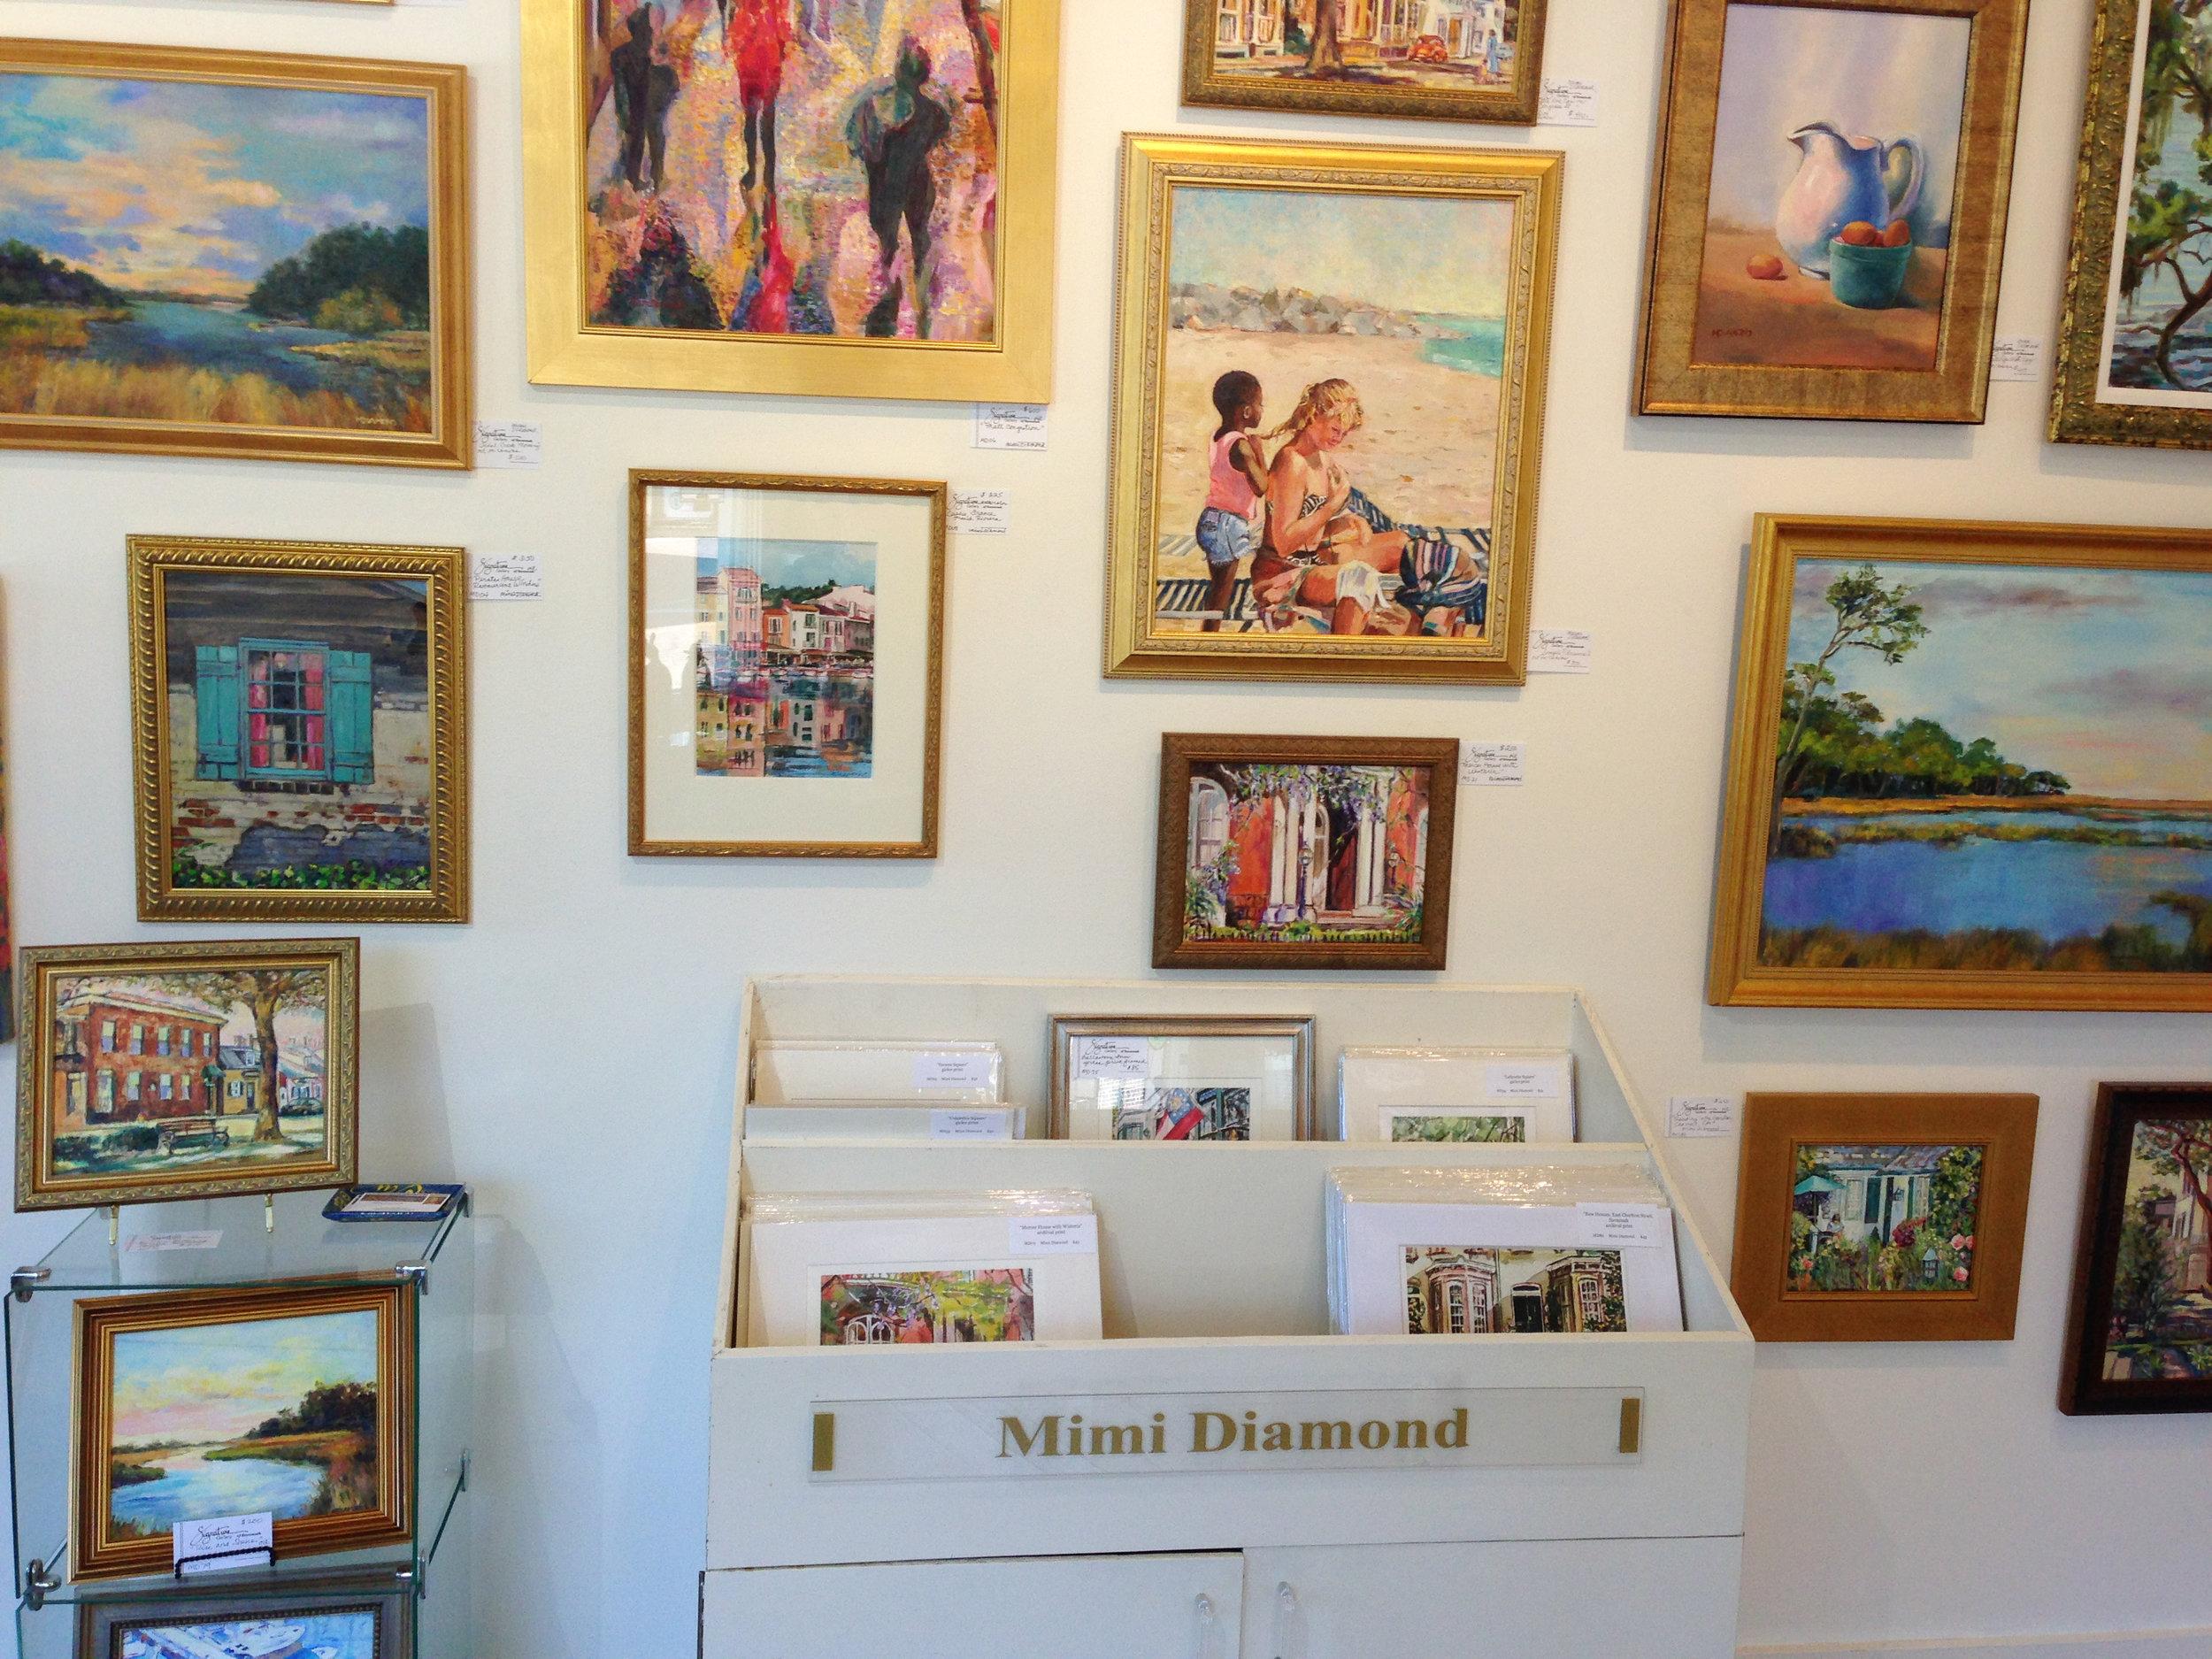 Mimi Diamond - Signature Gallery